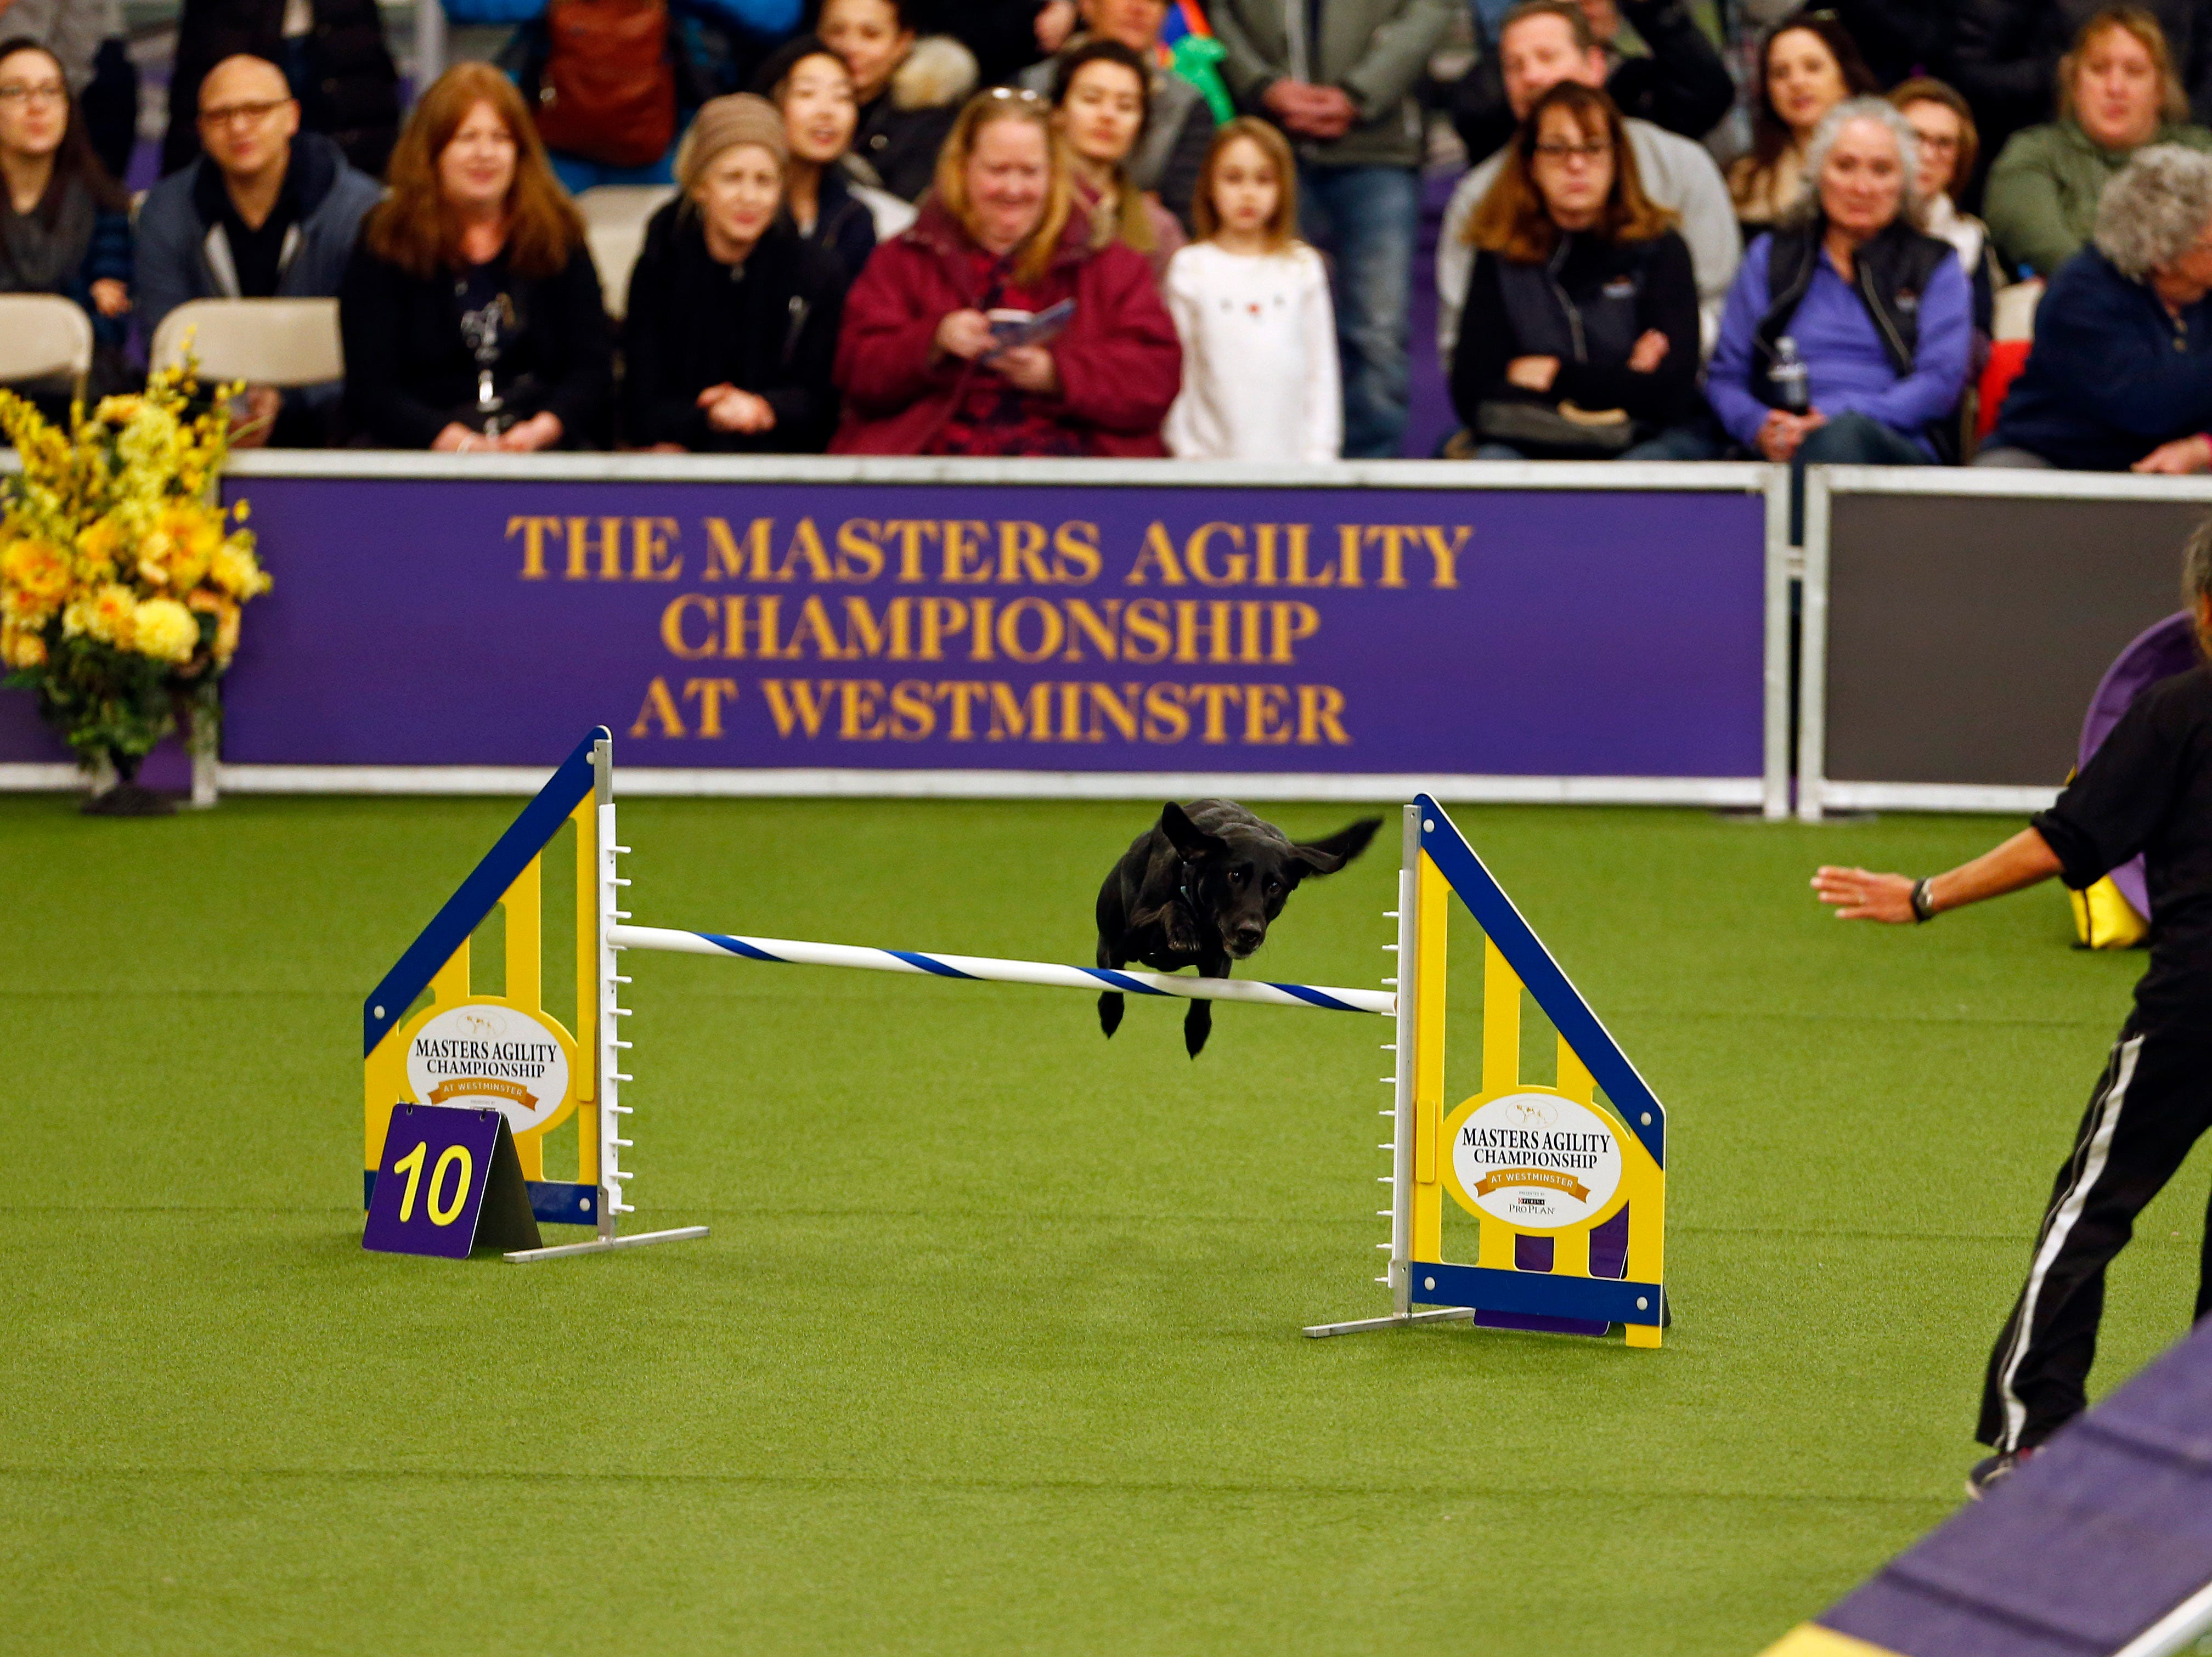 Chelsea, a Labrador Retriever, is seen during masters agility preliminaries.